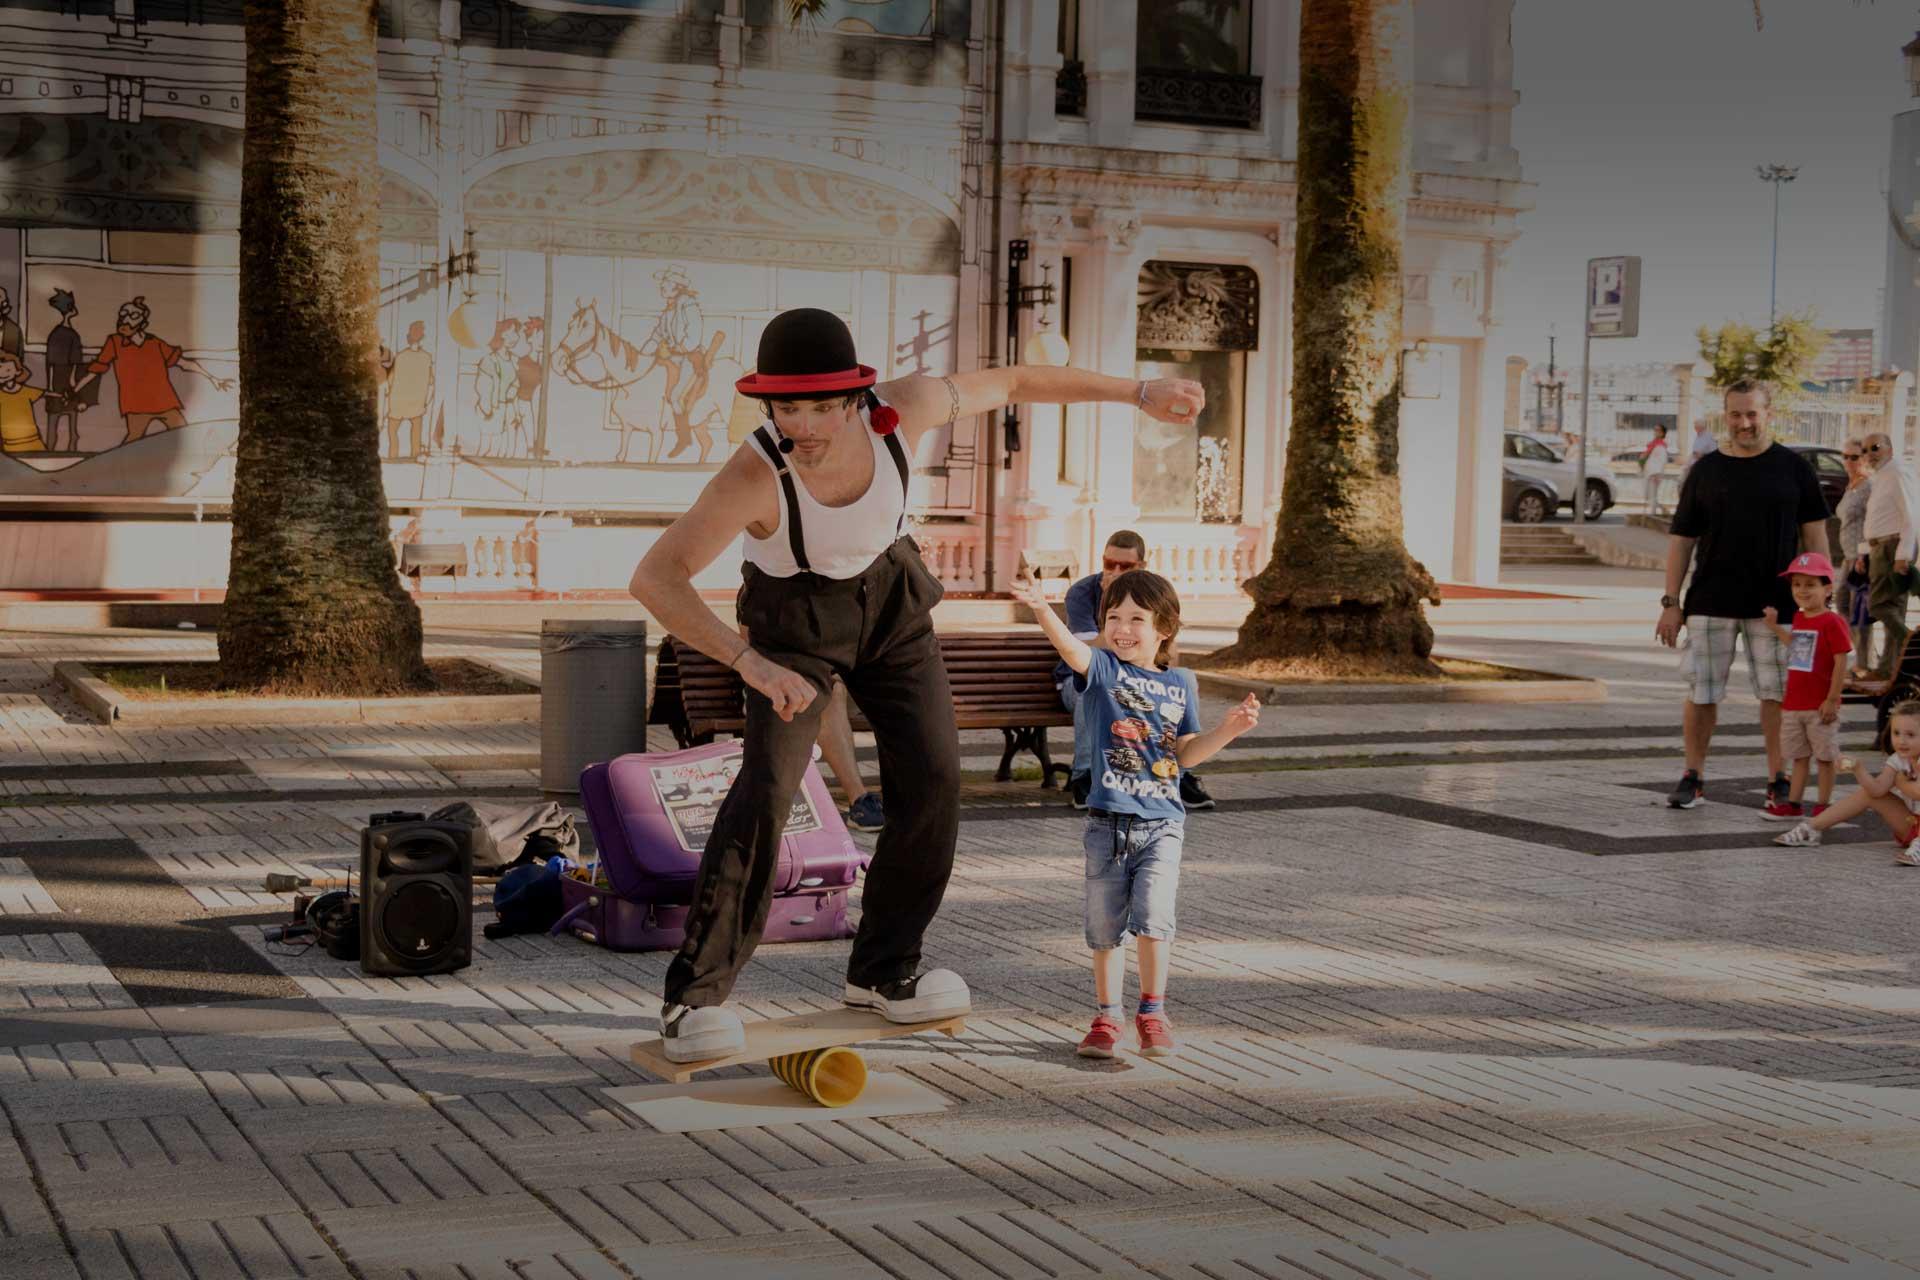 Espectáculo payaso Mere clown Galicia